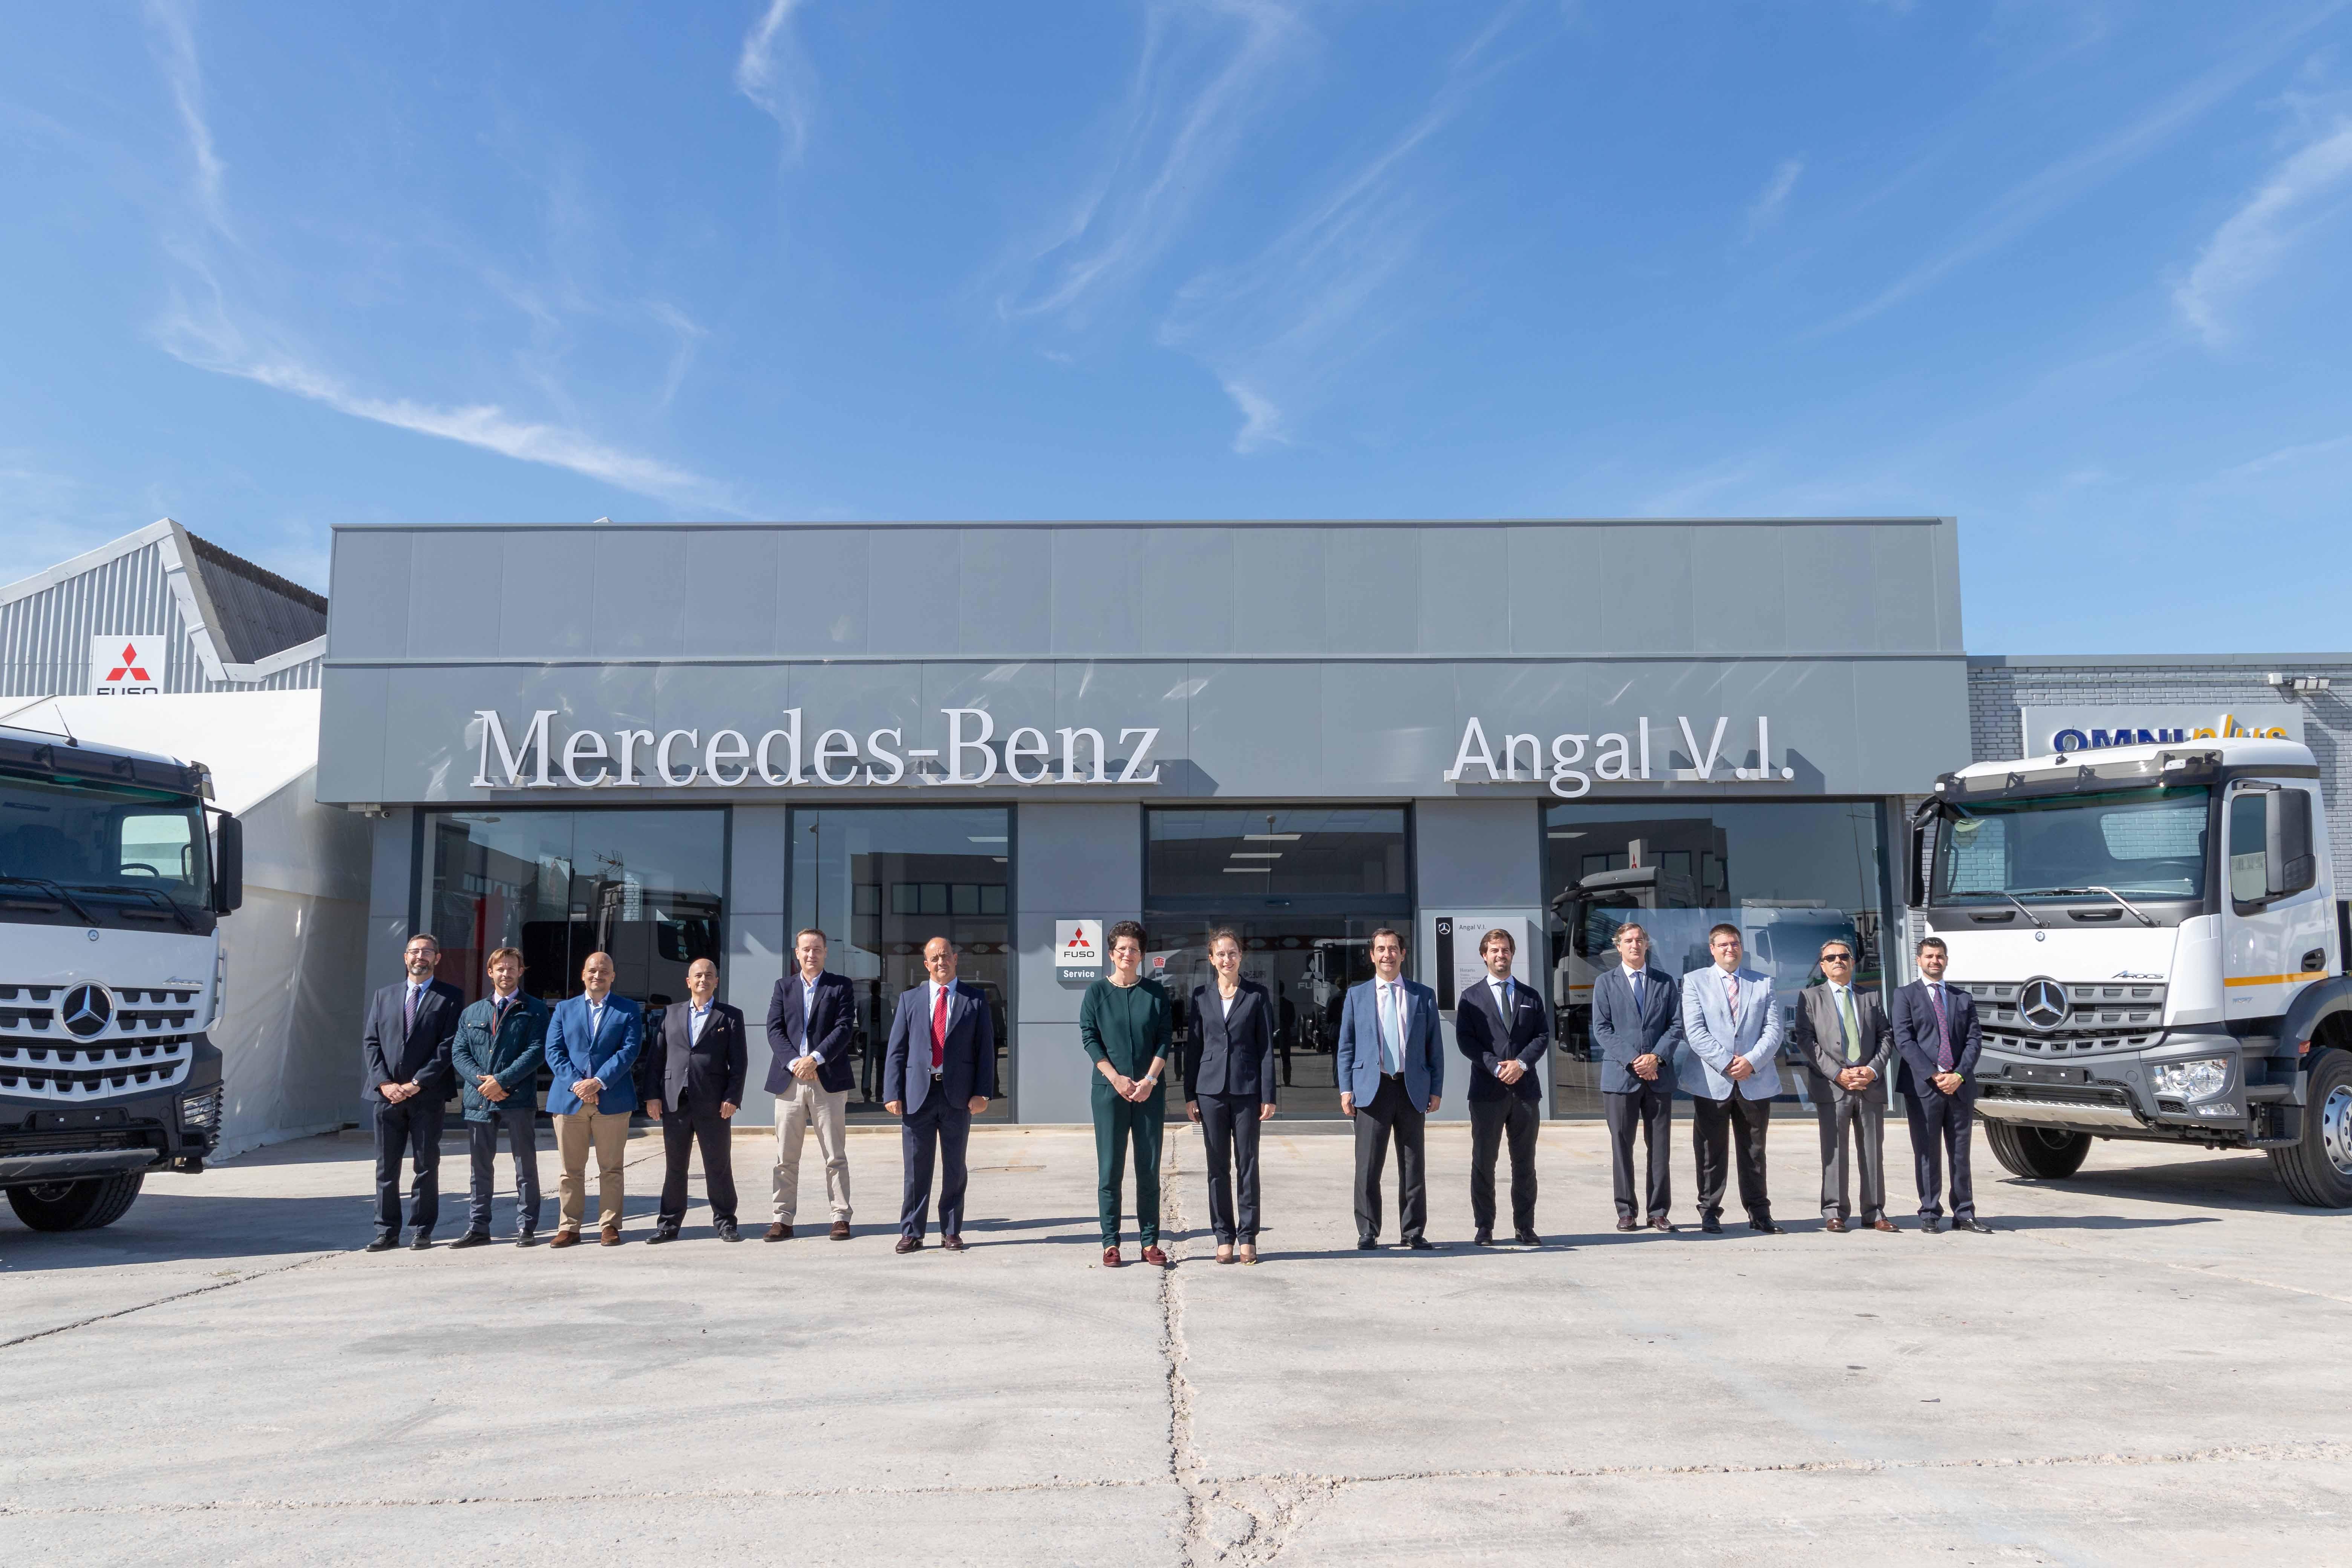 Grupo Angal está de inauguración de concesionario con Angal VI en Málaga.